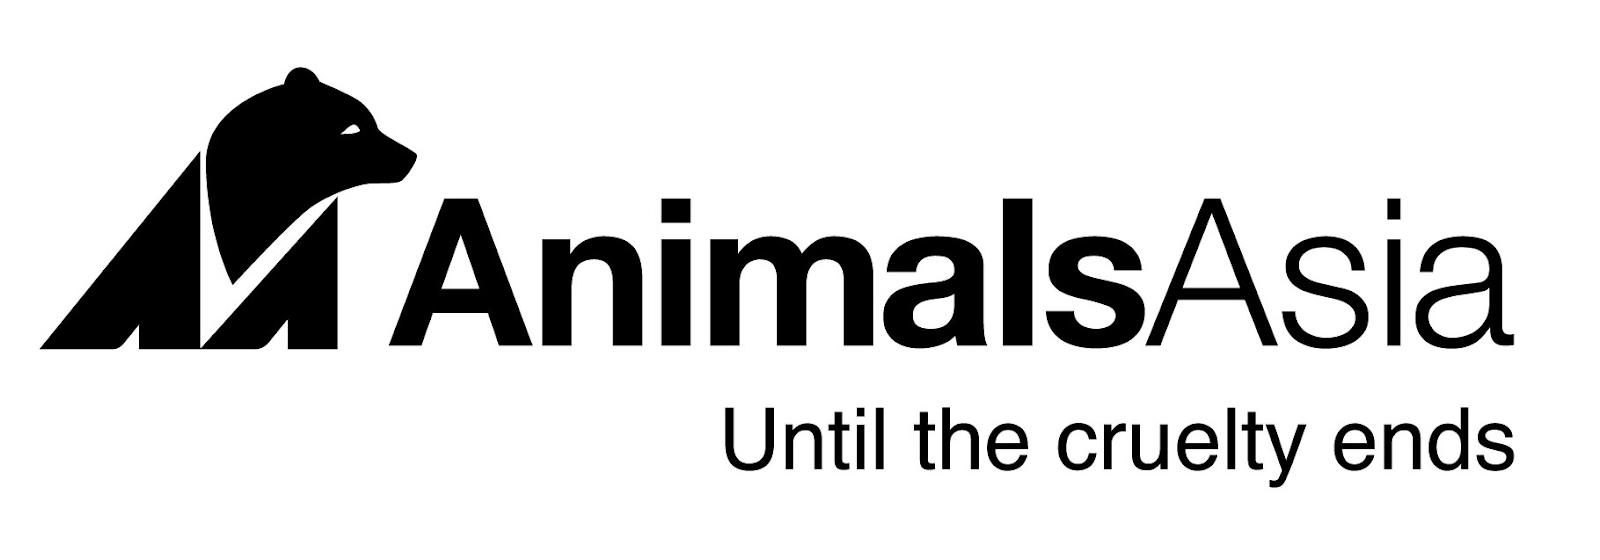 Zoo Jobs: January 2019